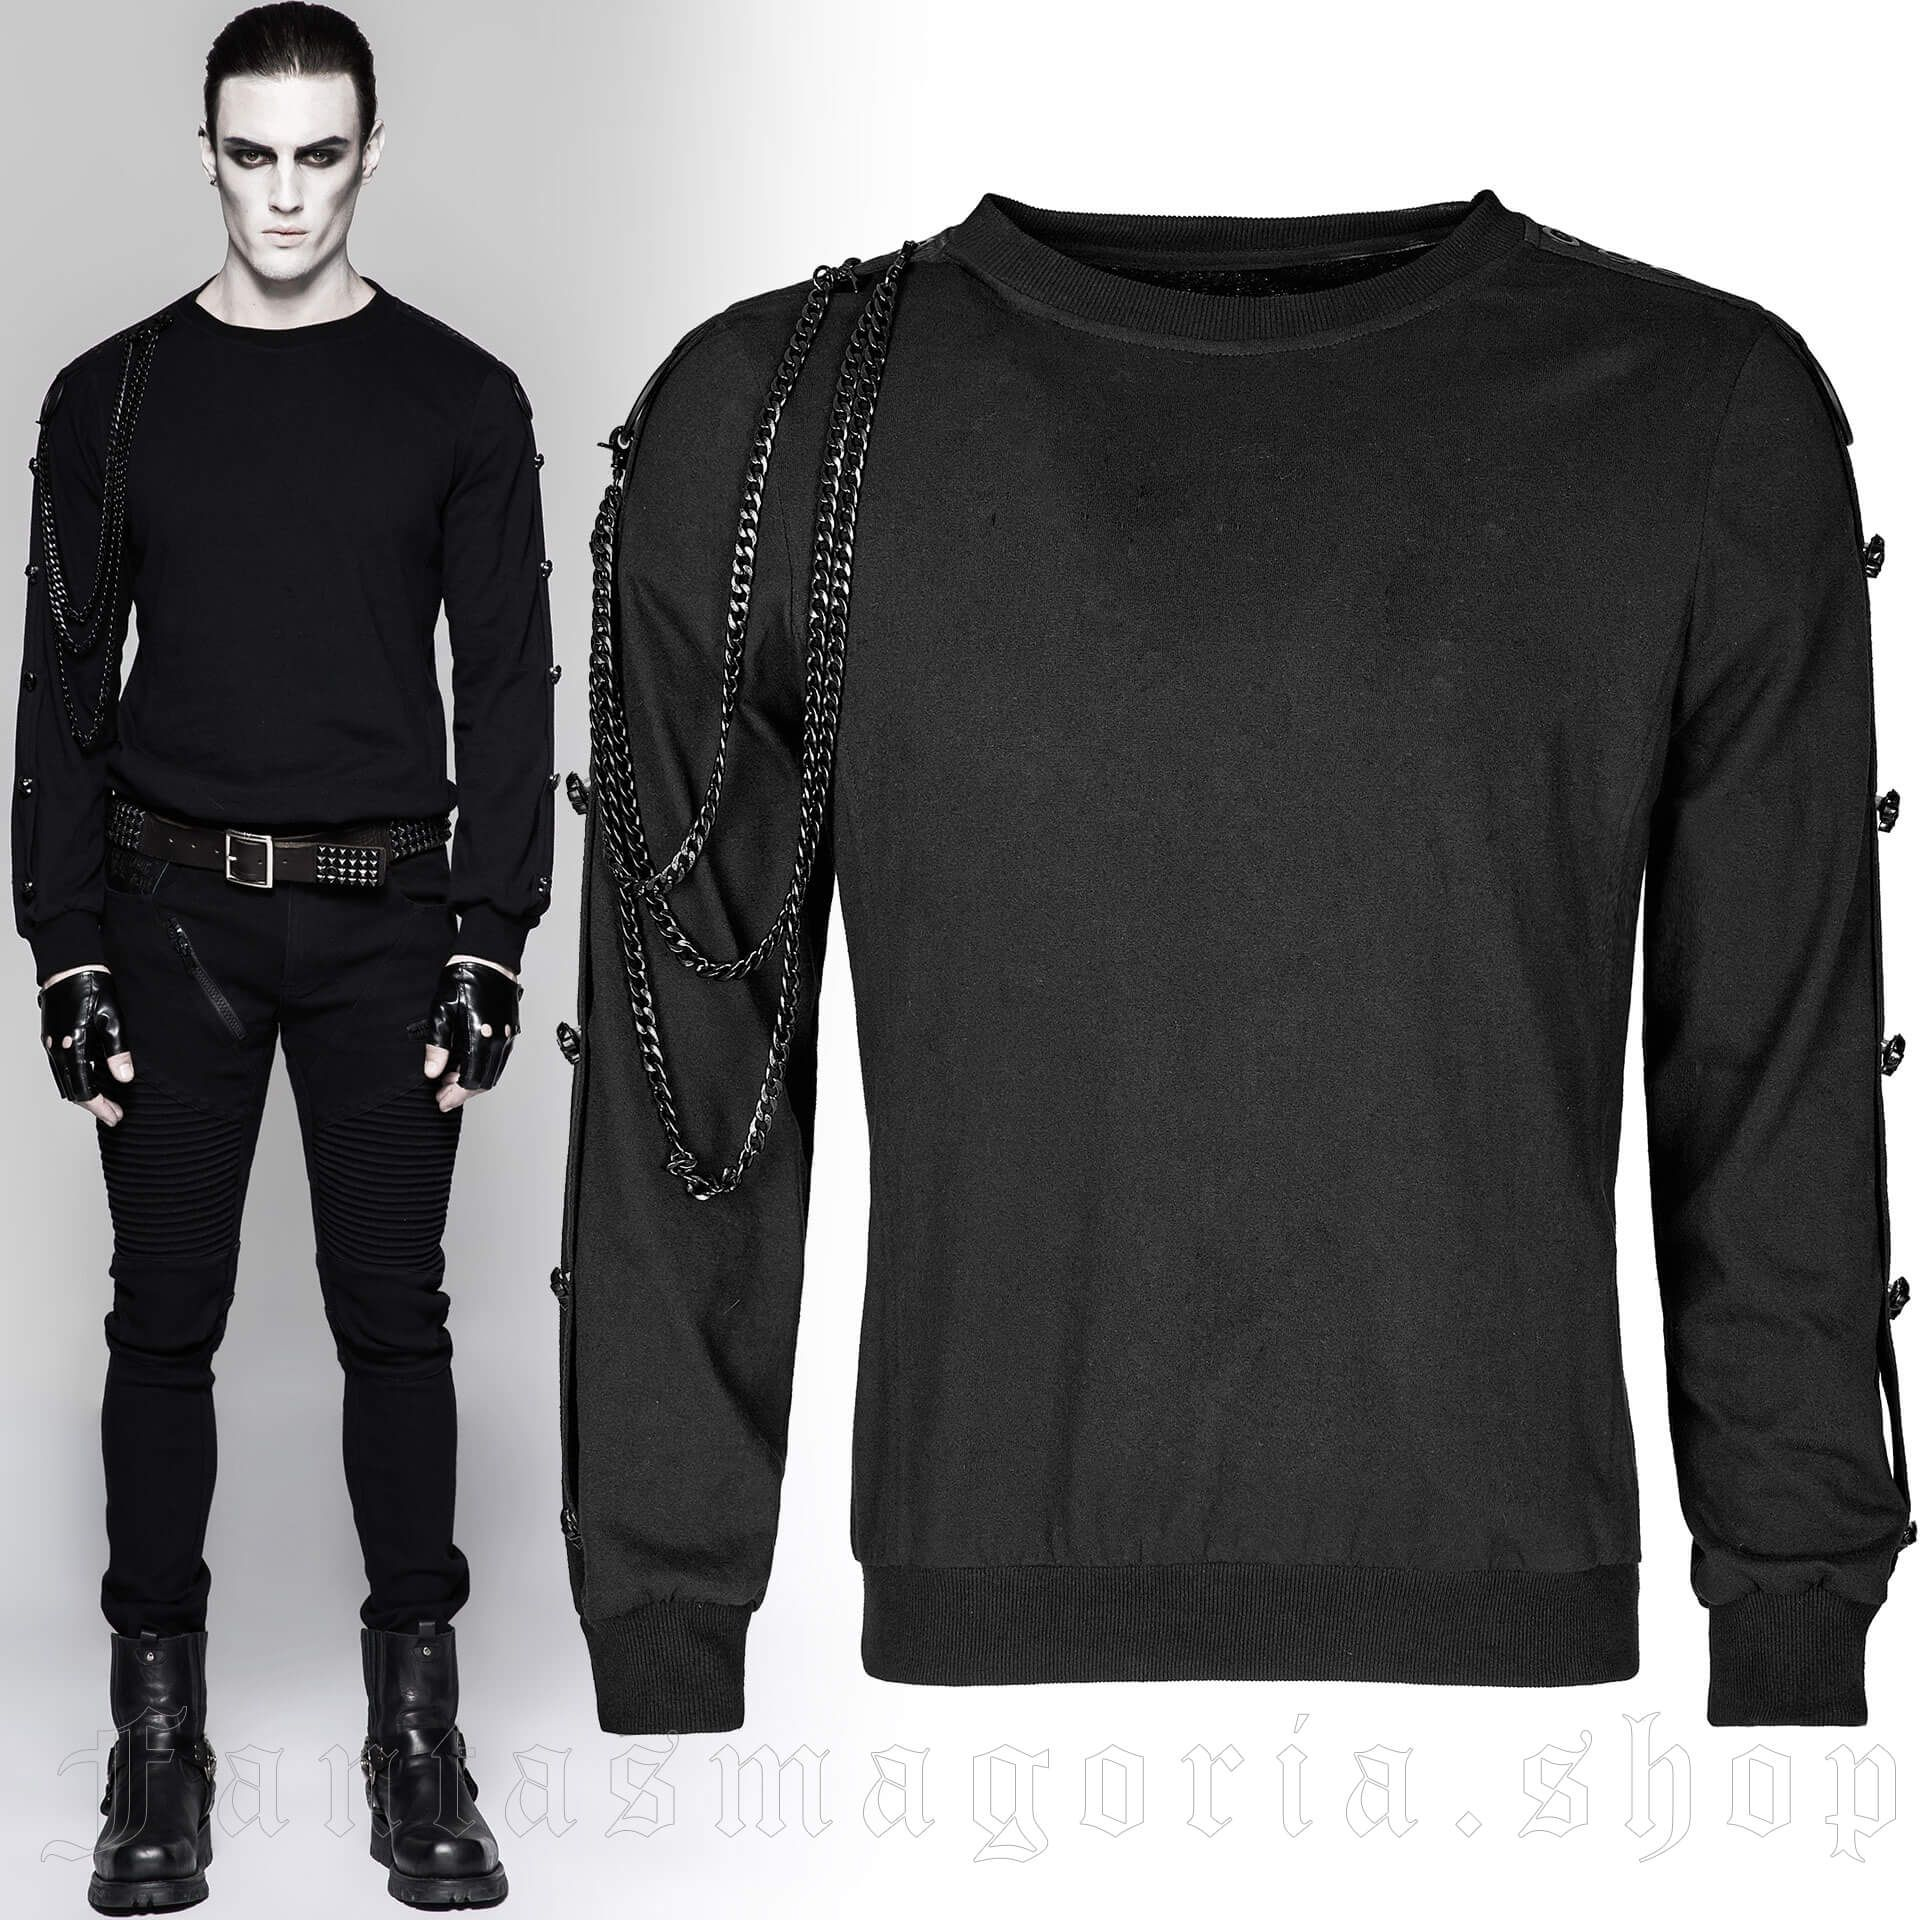 men's Skulls&Chains Longsleeve Top by PUNK RAVE brand, code: T-469